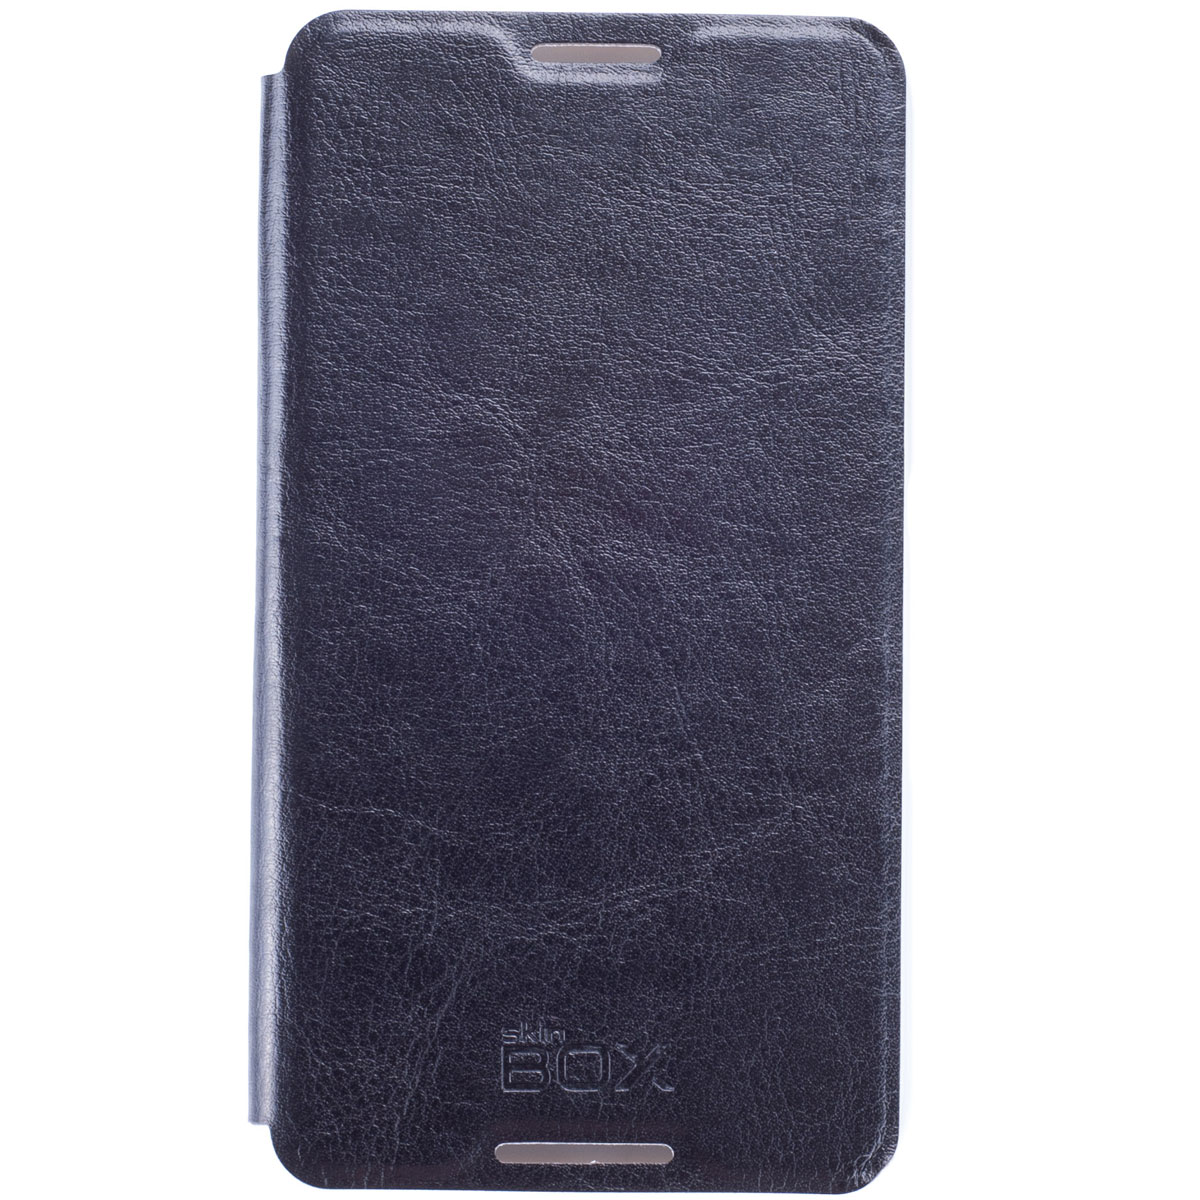 Skinbox Lux чехол для Sony Xperia E4, Black skinbox lux чехол для sony xperia c5 ultra white